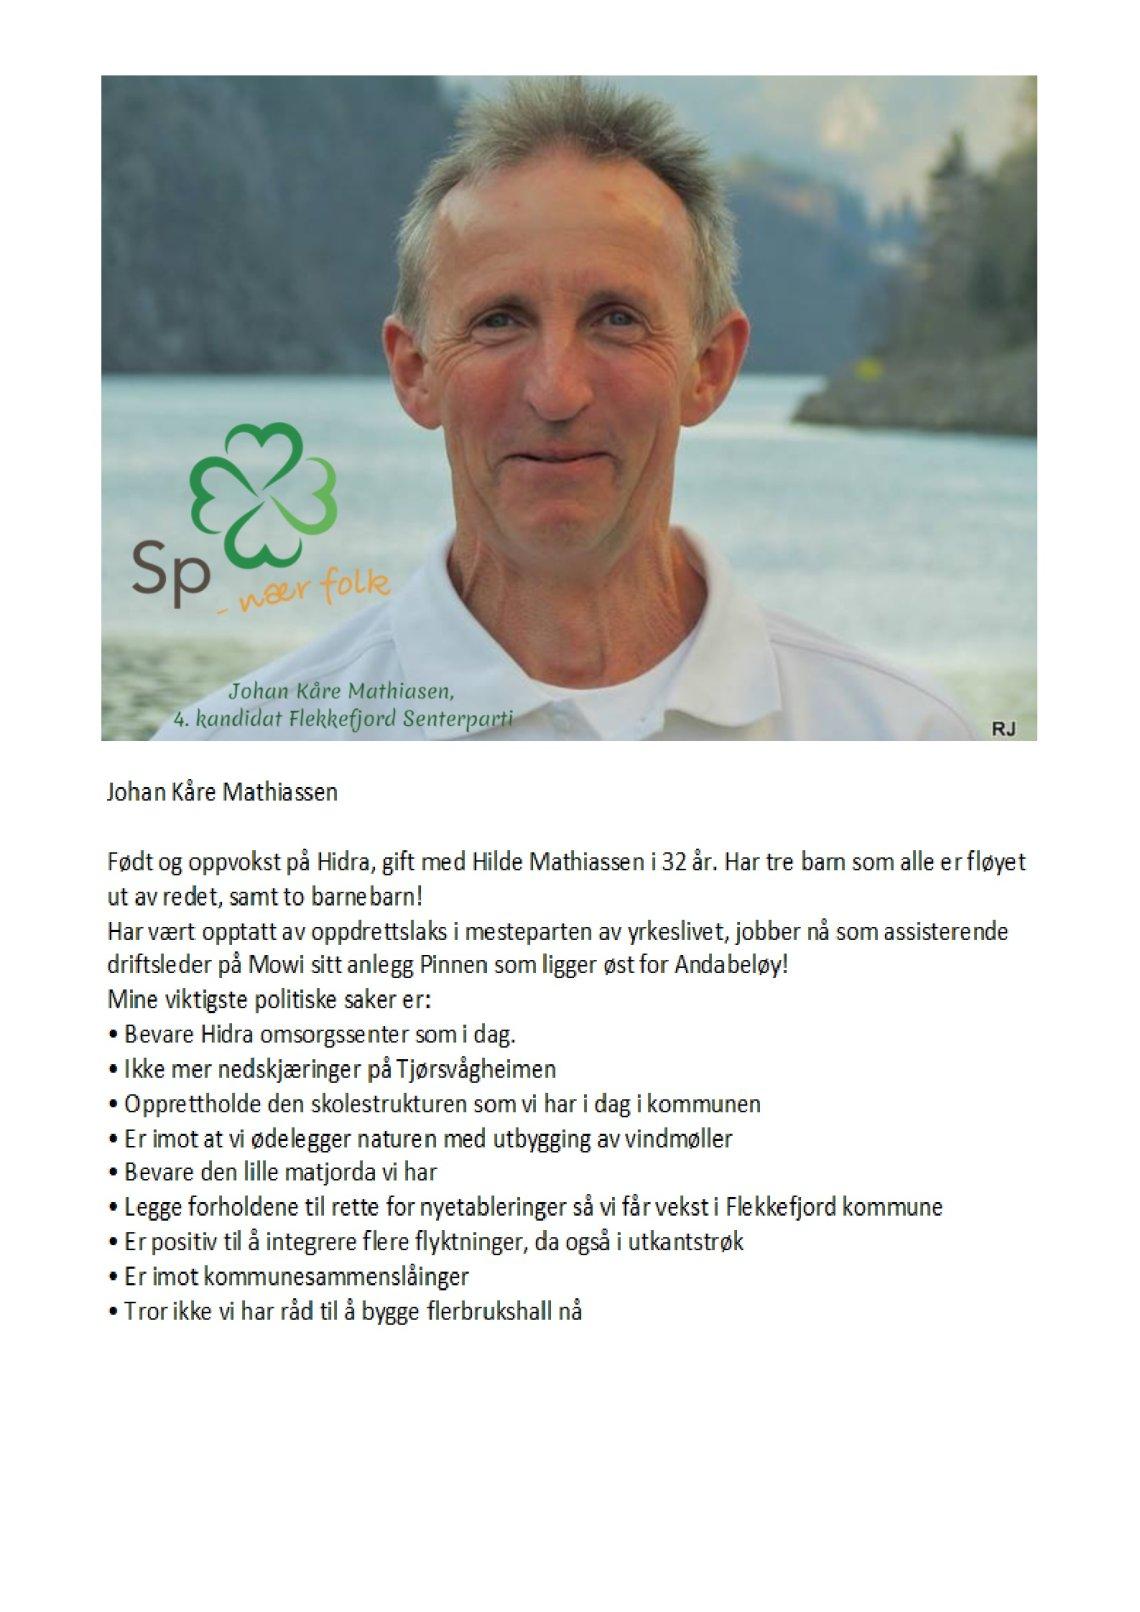 Johan Kåre Mathiassen